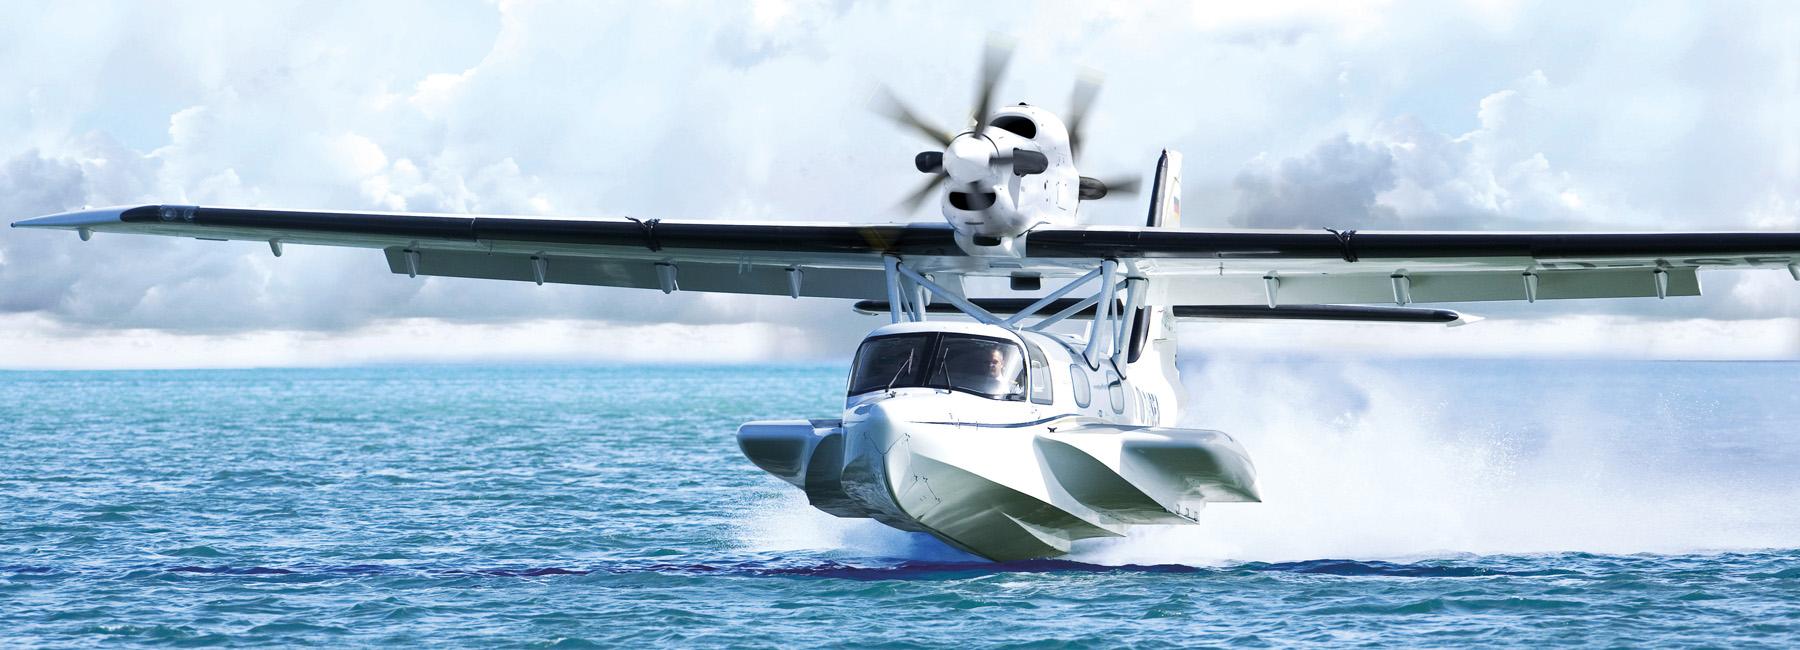 Dornier Seastar Revives The Seaster Amphibious Aircraft